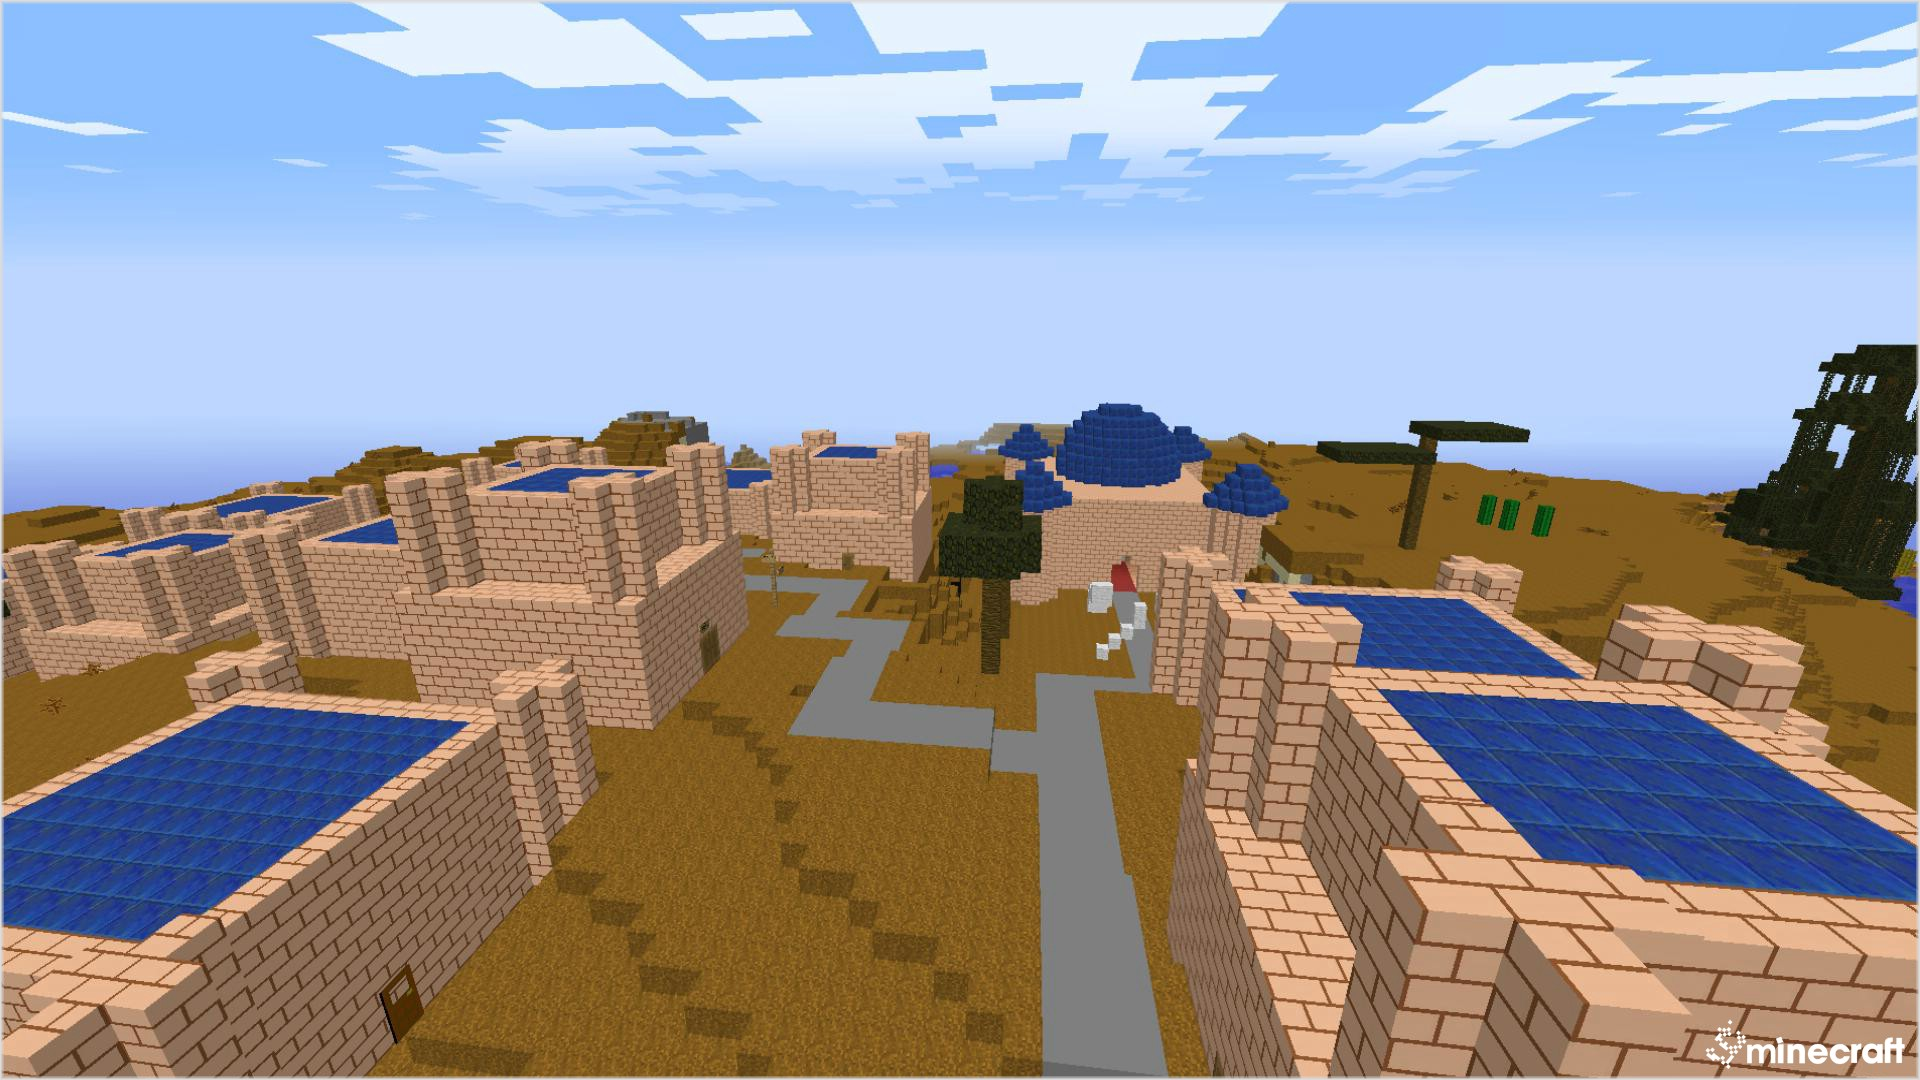 http://minecraft-forum.net/wp-content/uploads/2013/12/9f907__The-Safari-Map-3.jpg